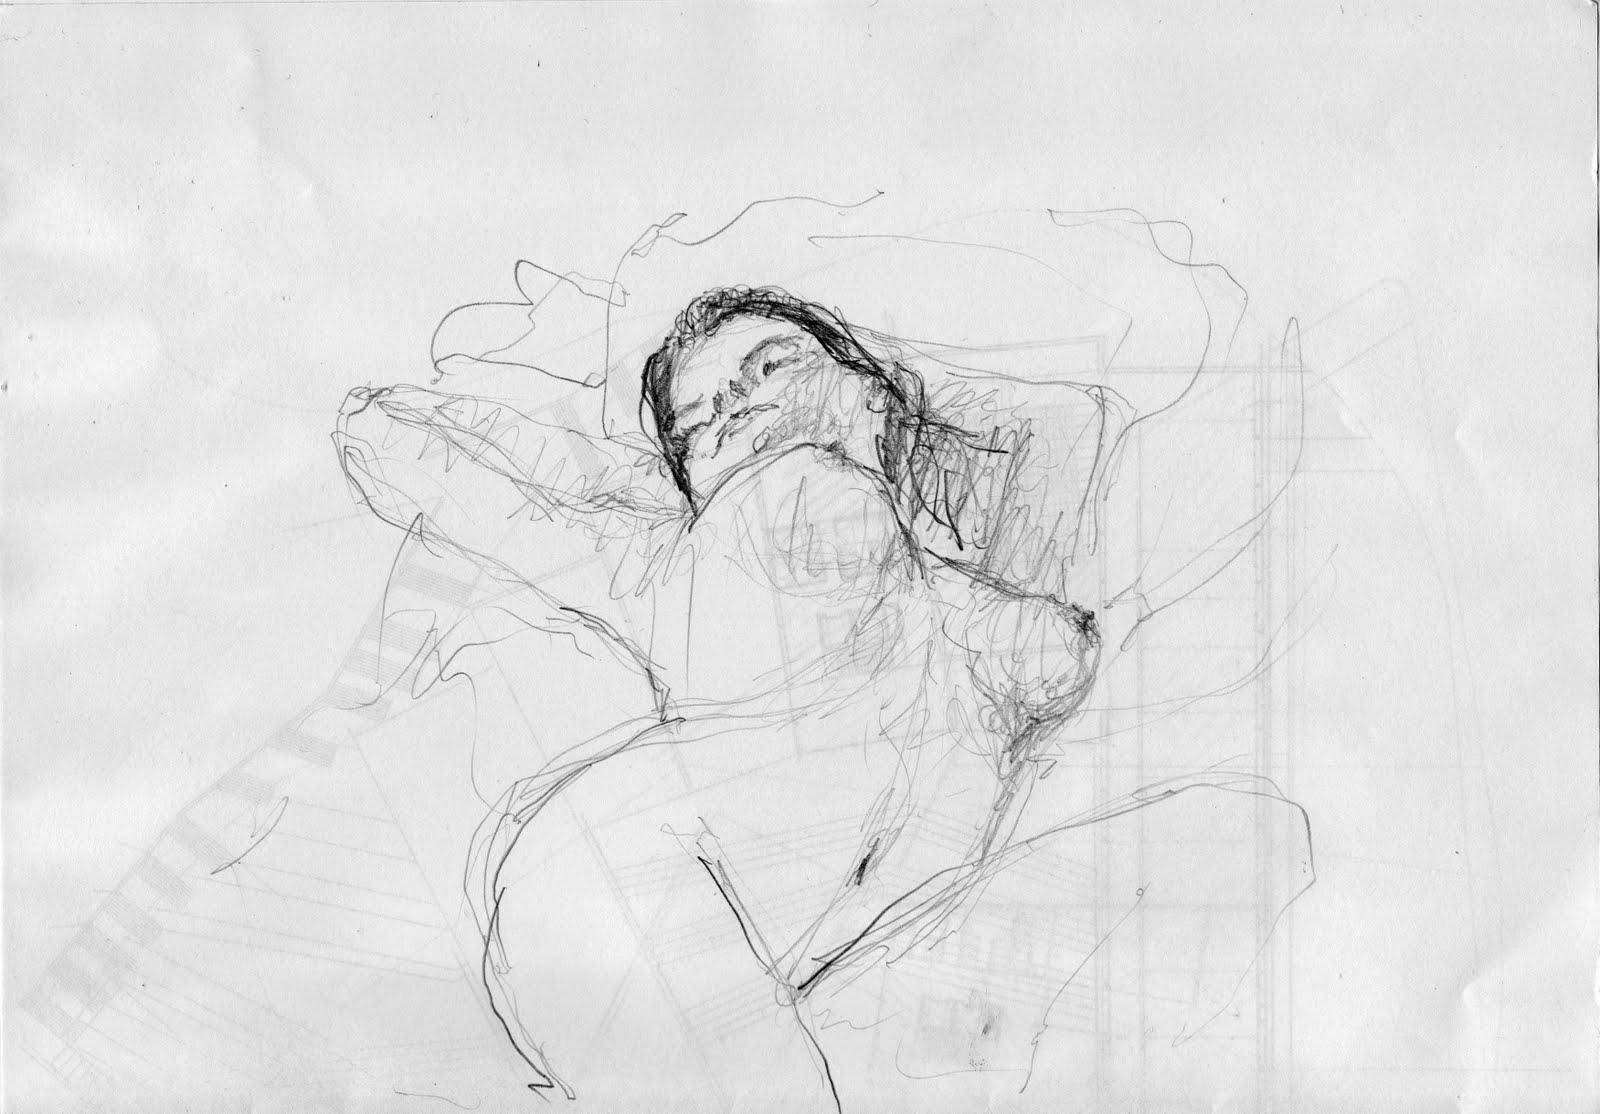 Anatomia femenina | EL METAFISICO RELATIVISTA